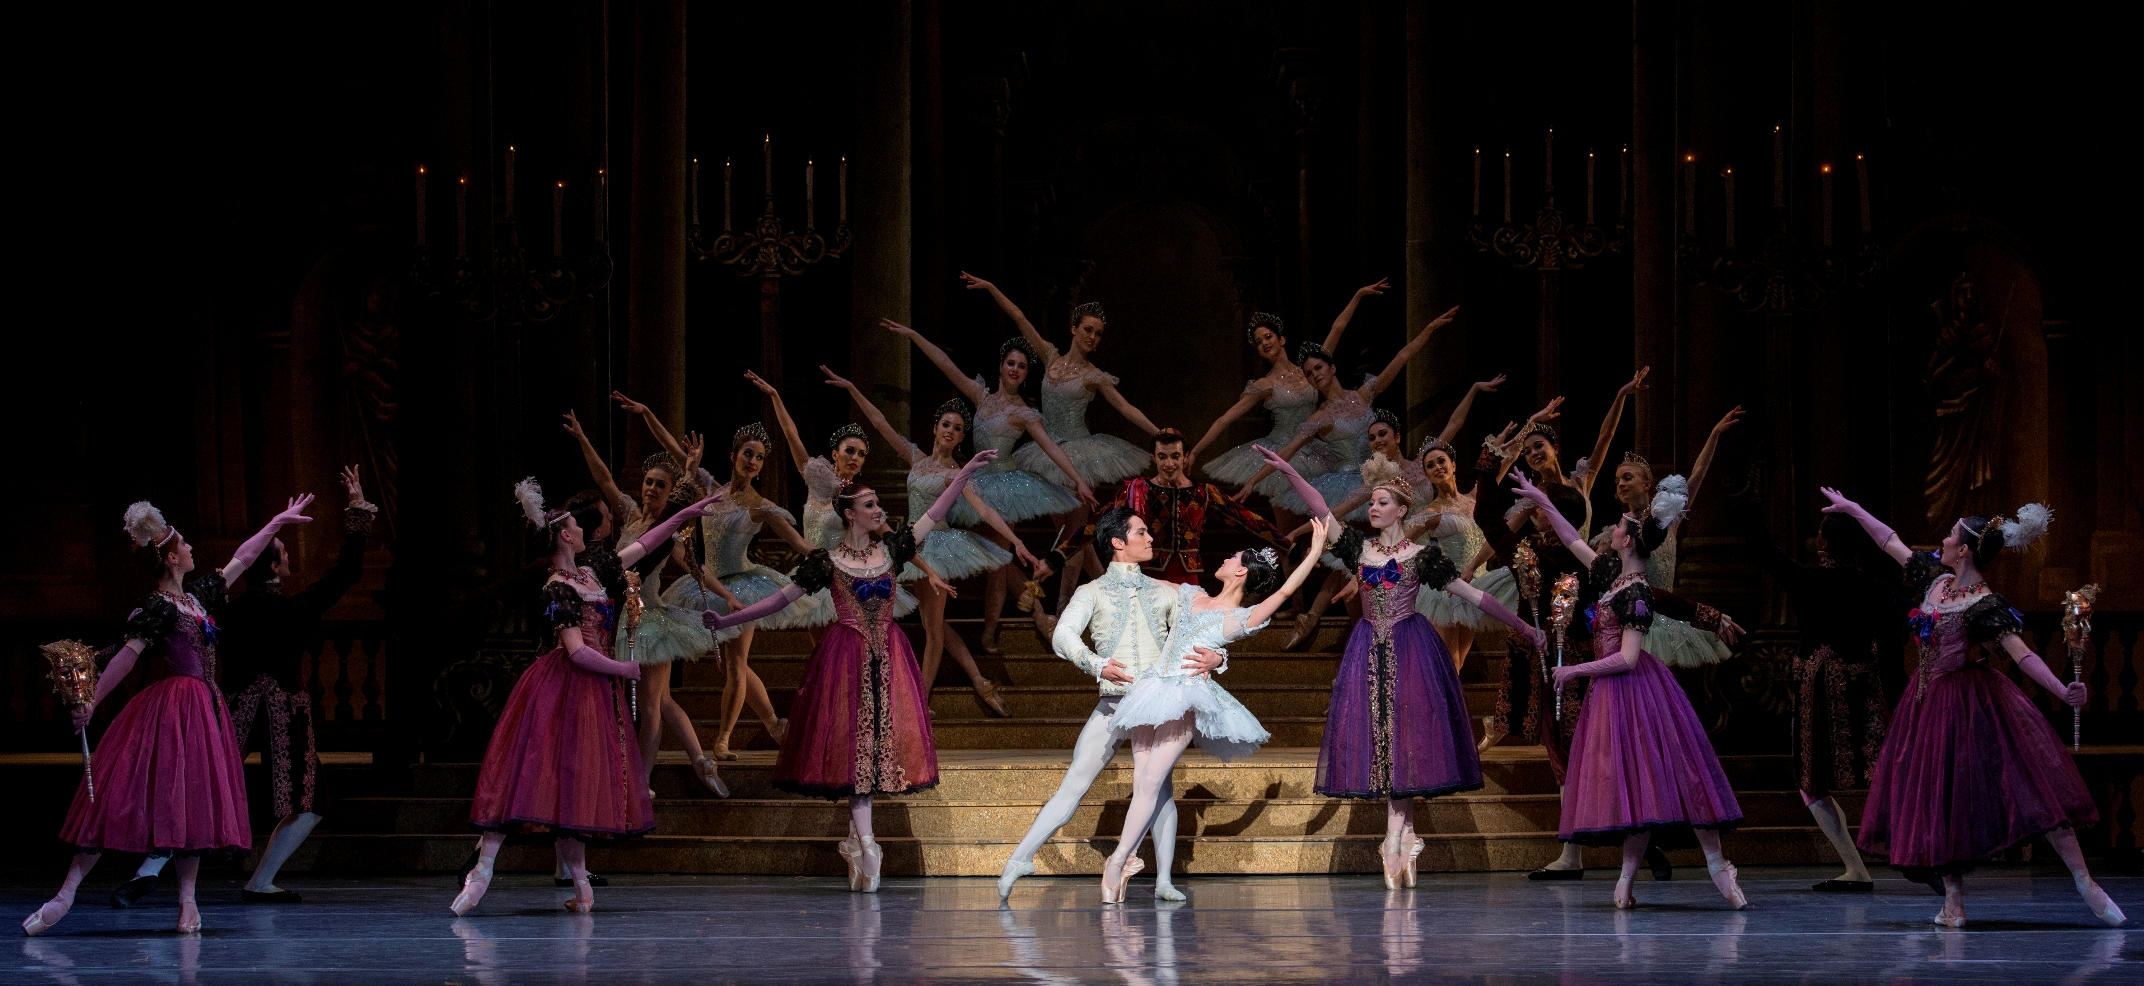 Jeffrey Cirio and Misa Kuranaga in Ashton's Cinderella ©Gene Schiavone